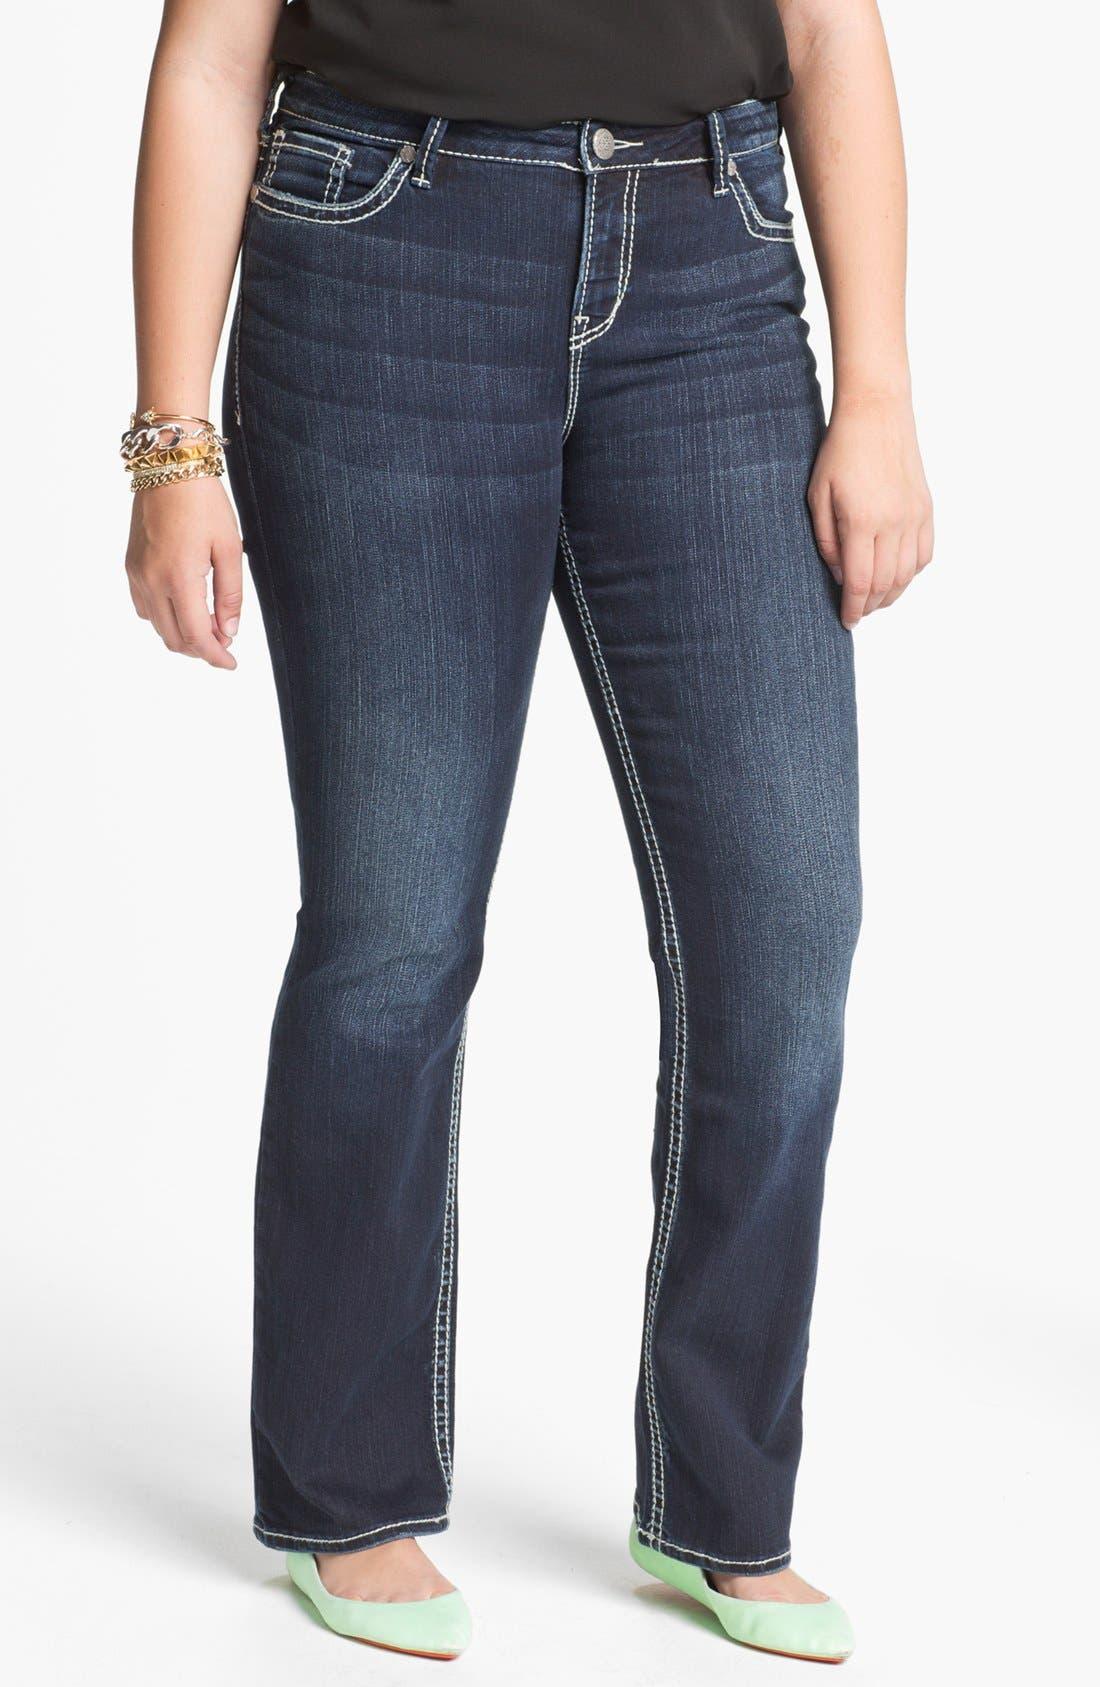 Main Image - Silver Jeans Co. 'Natsuki' Bootcut Jeans (Juniors Plus)